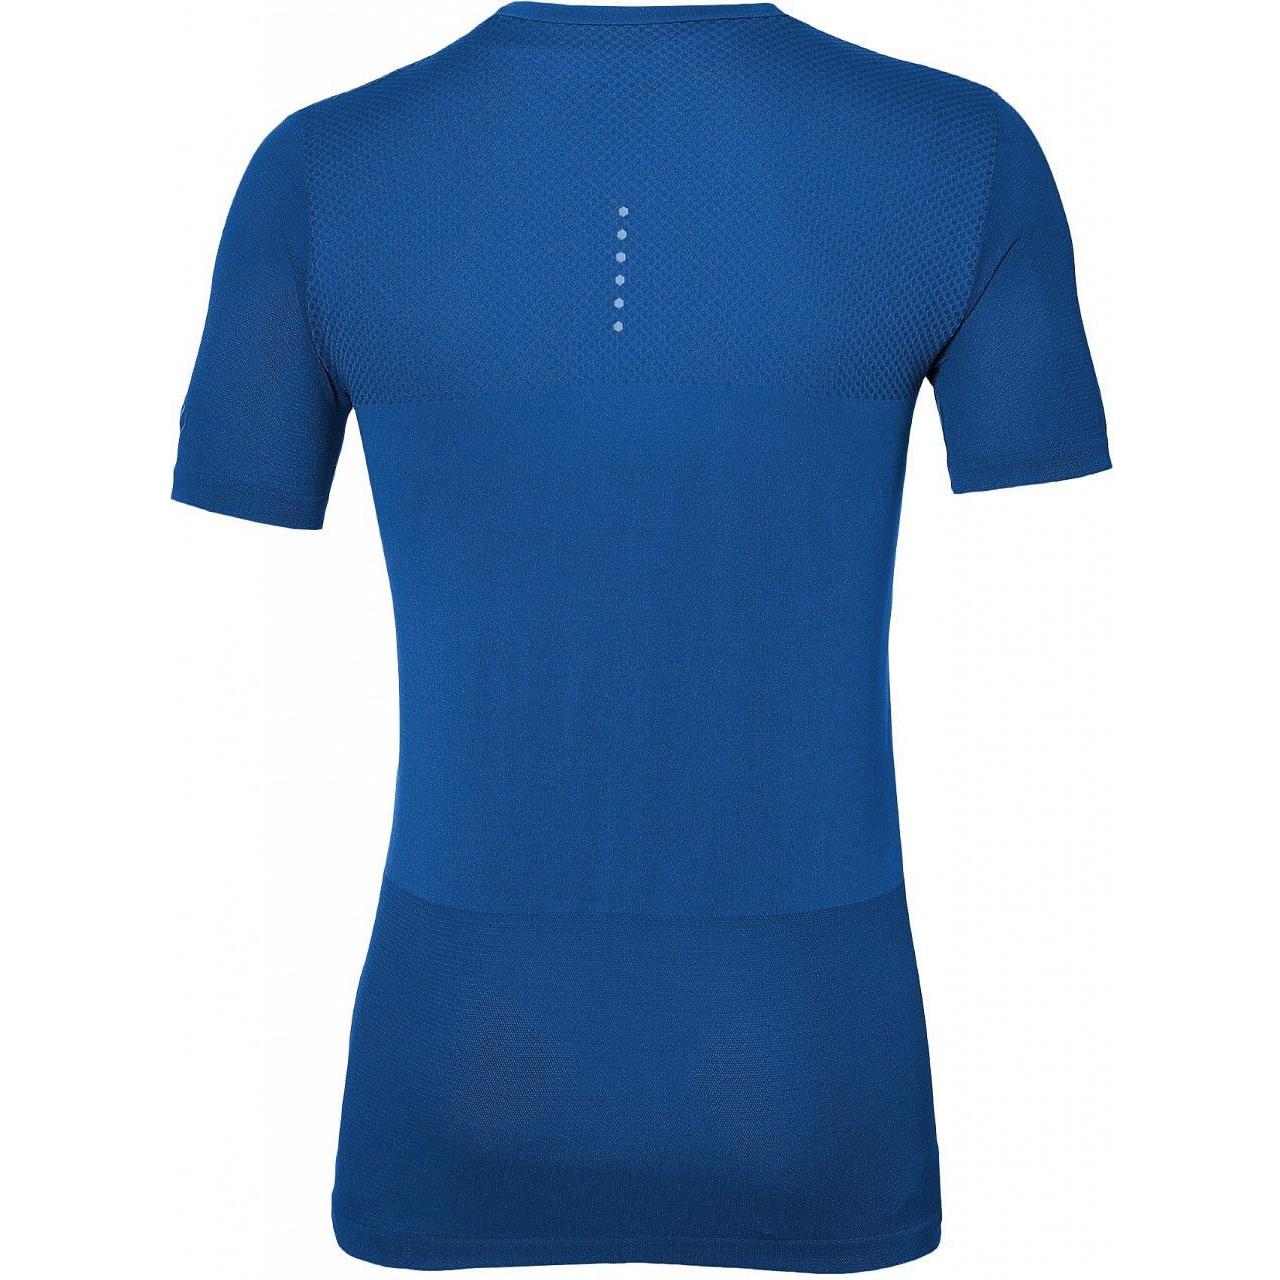 Asics-FuzeX-Seamless-Short-Sleeve-Mens-Running-Fitness-Shirt-Top thumbnail 6